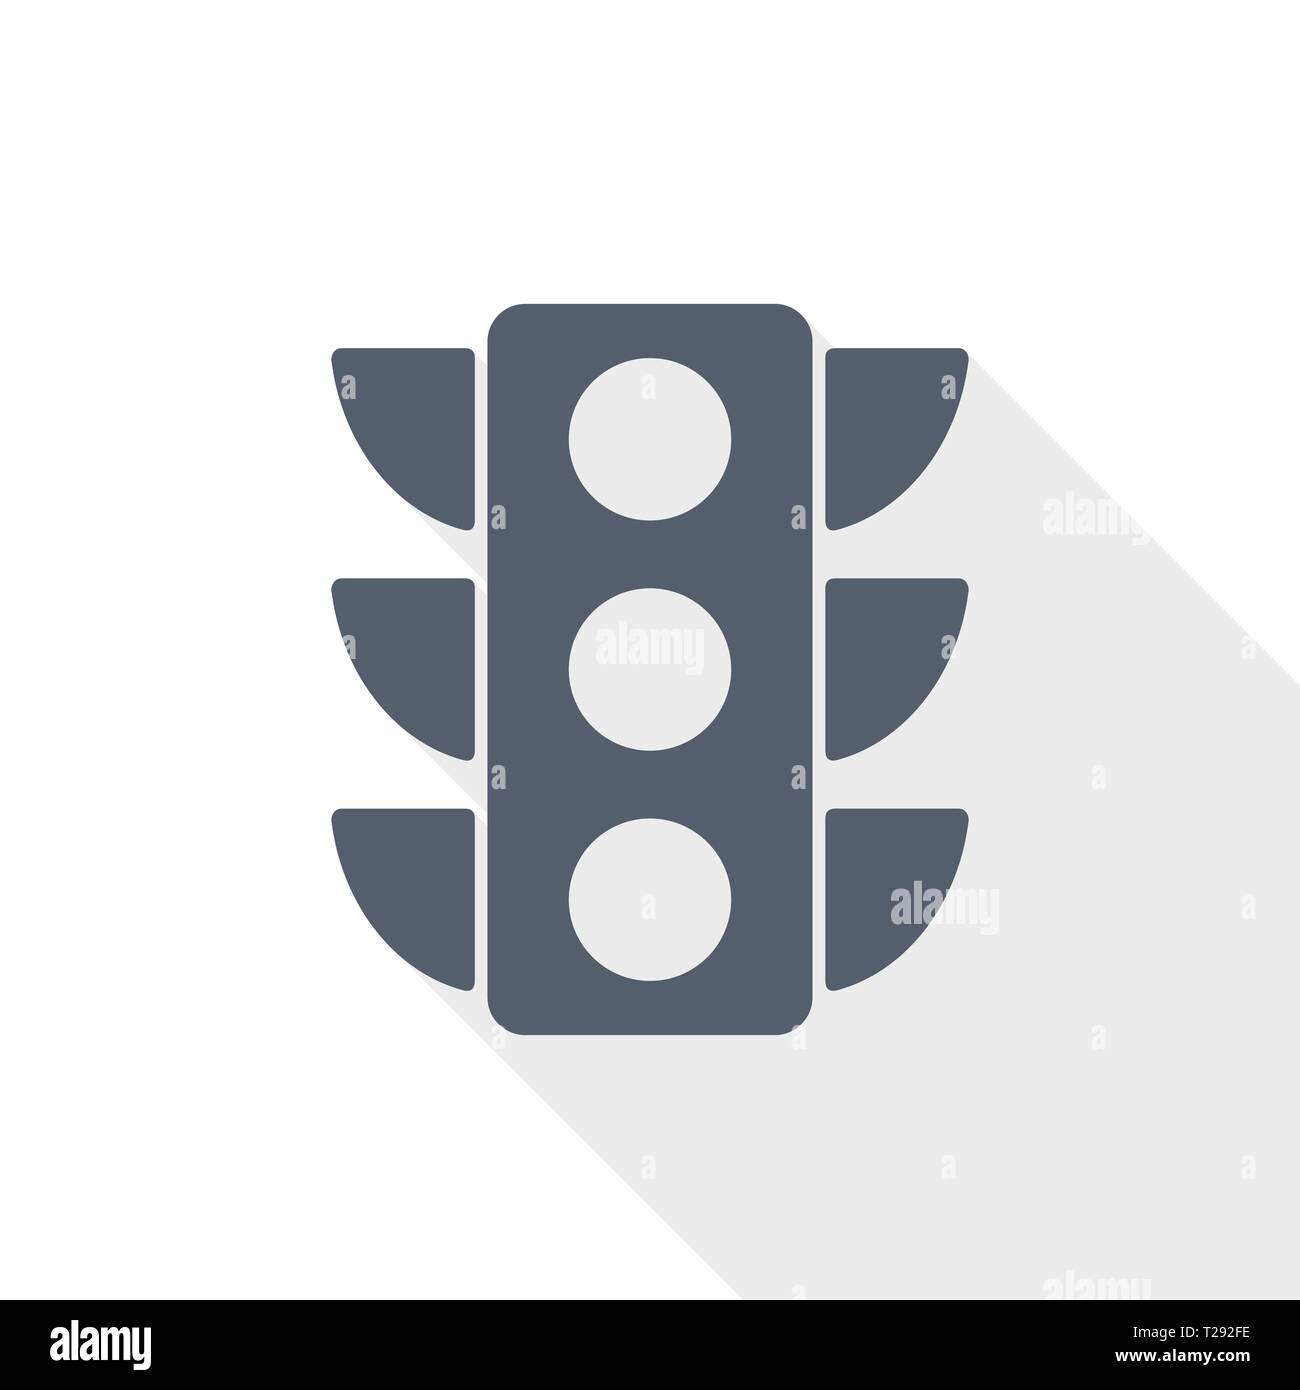 traffic lights web icon, flat design vector illustration Stock Vector